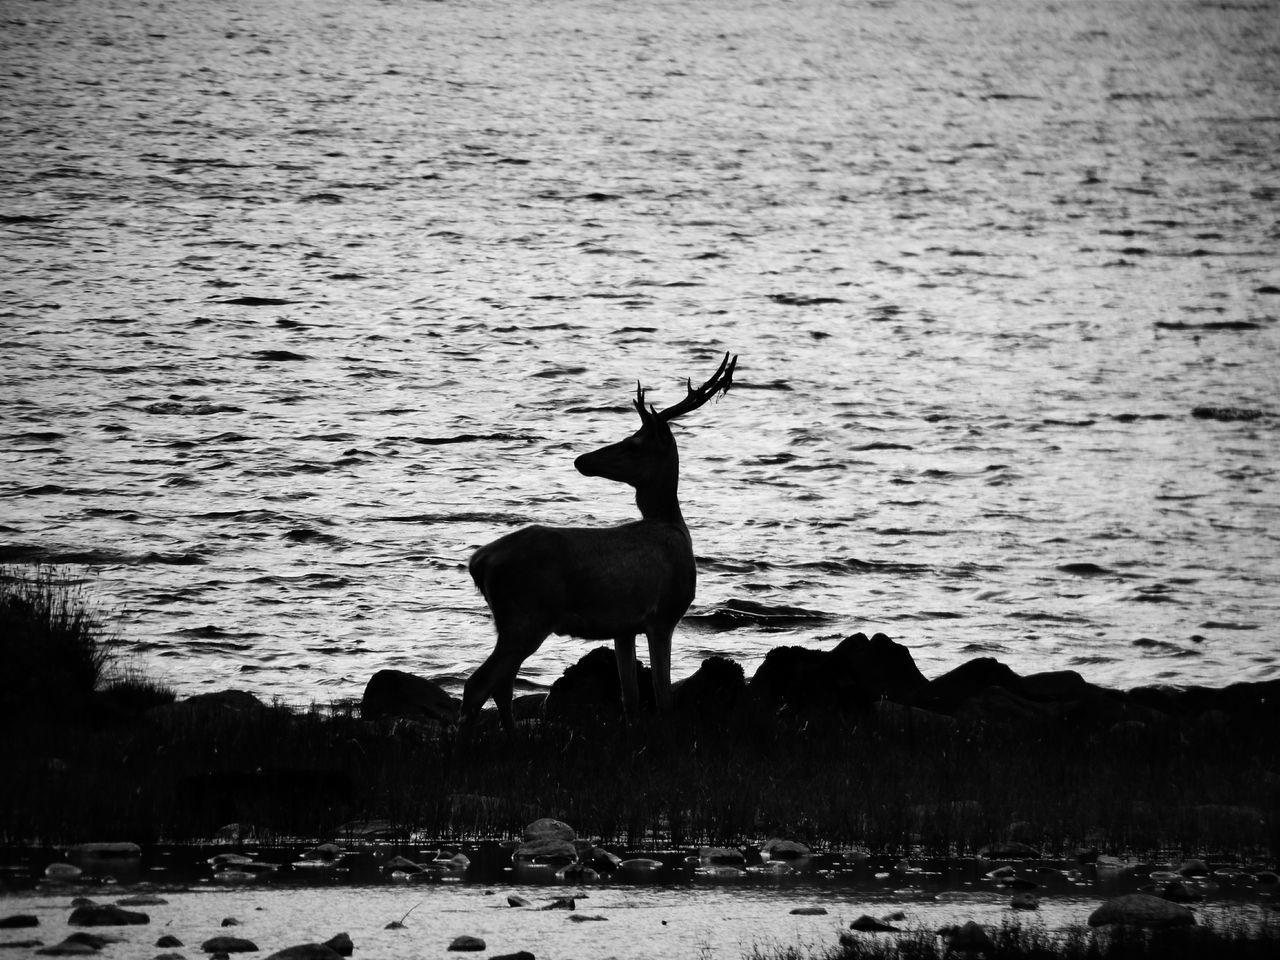 Reddeer Blackandwhite Animals Animallovers Deer By A Lake Lakeshore Lakeside Nature Naturelovers